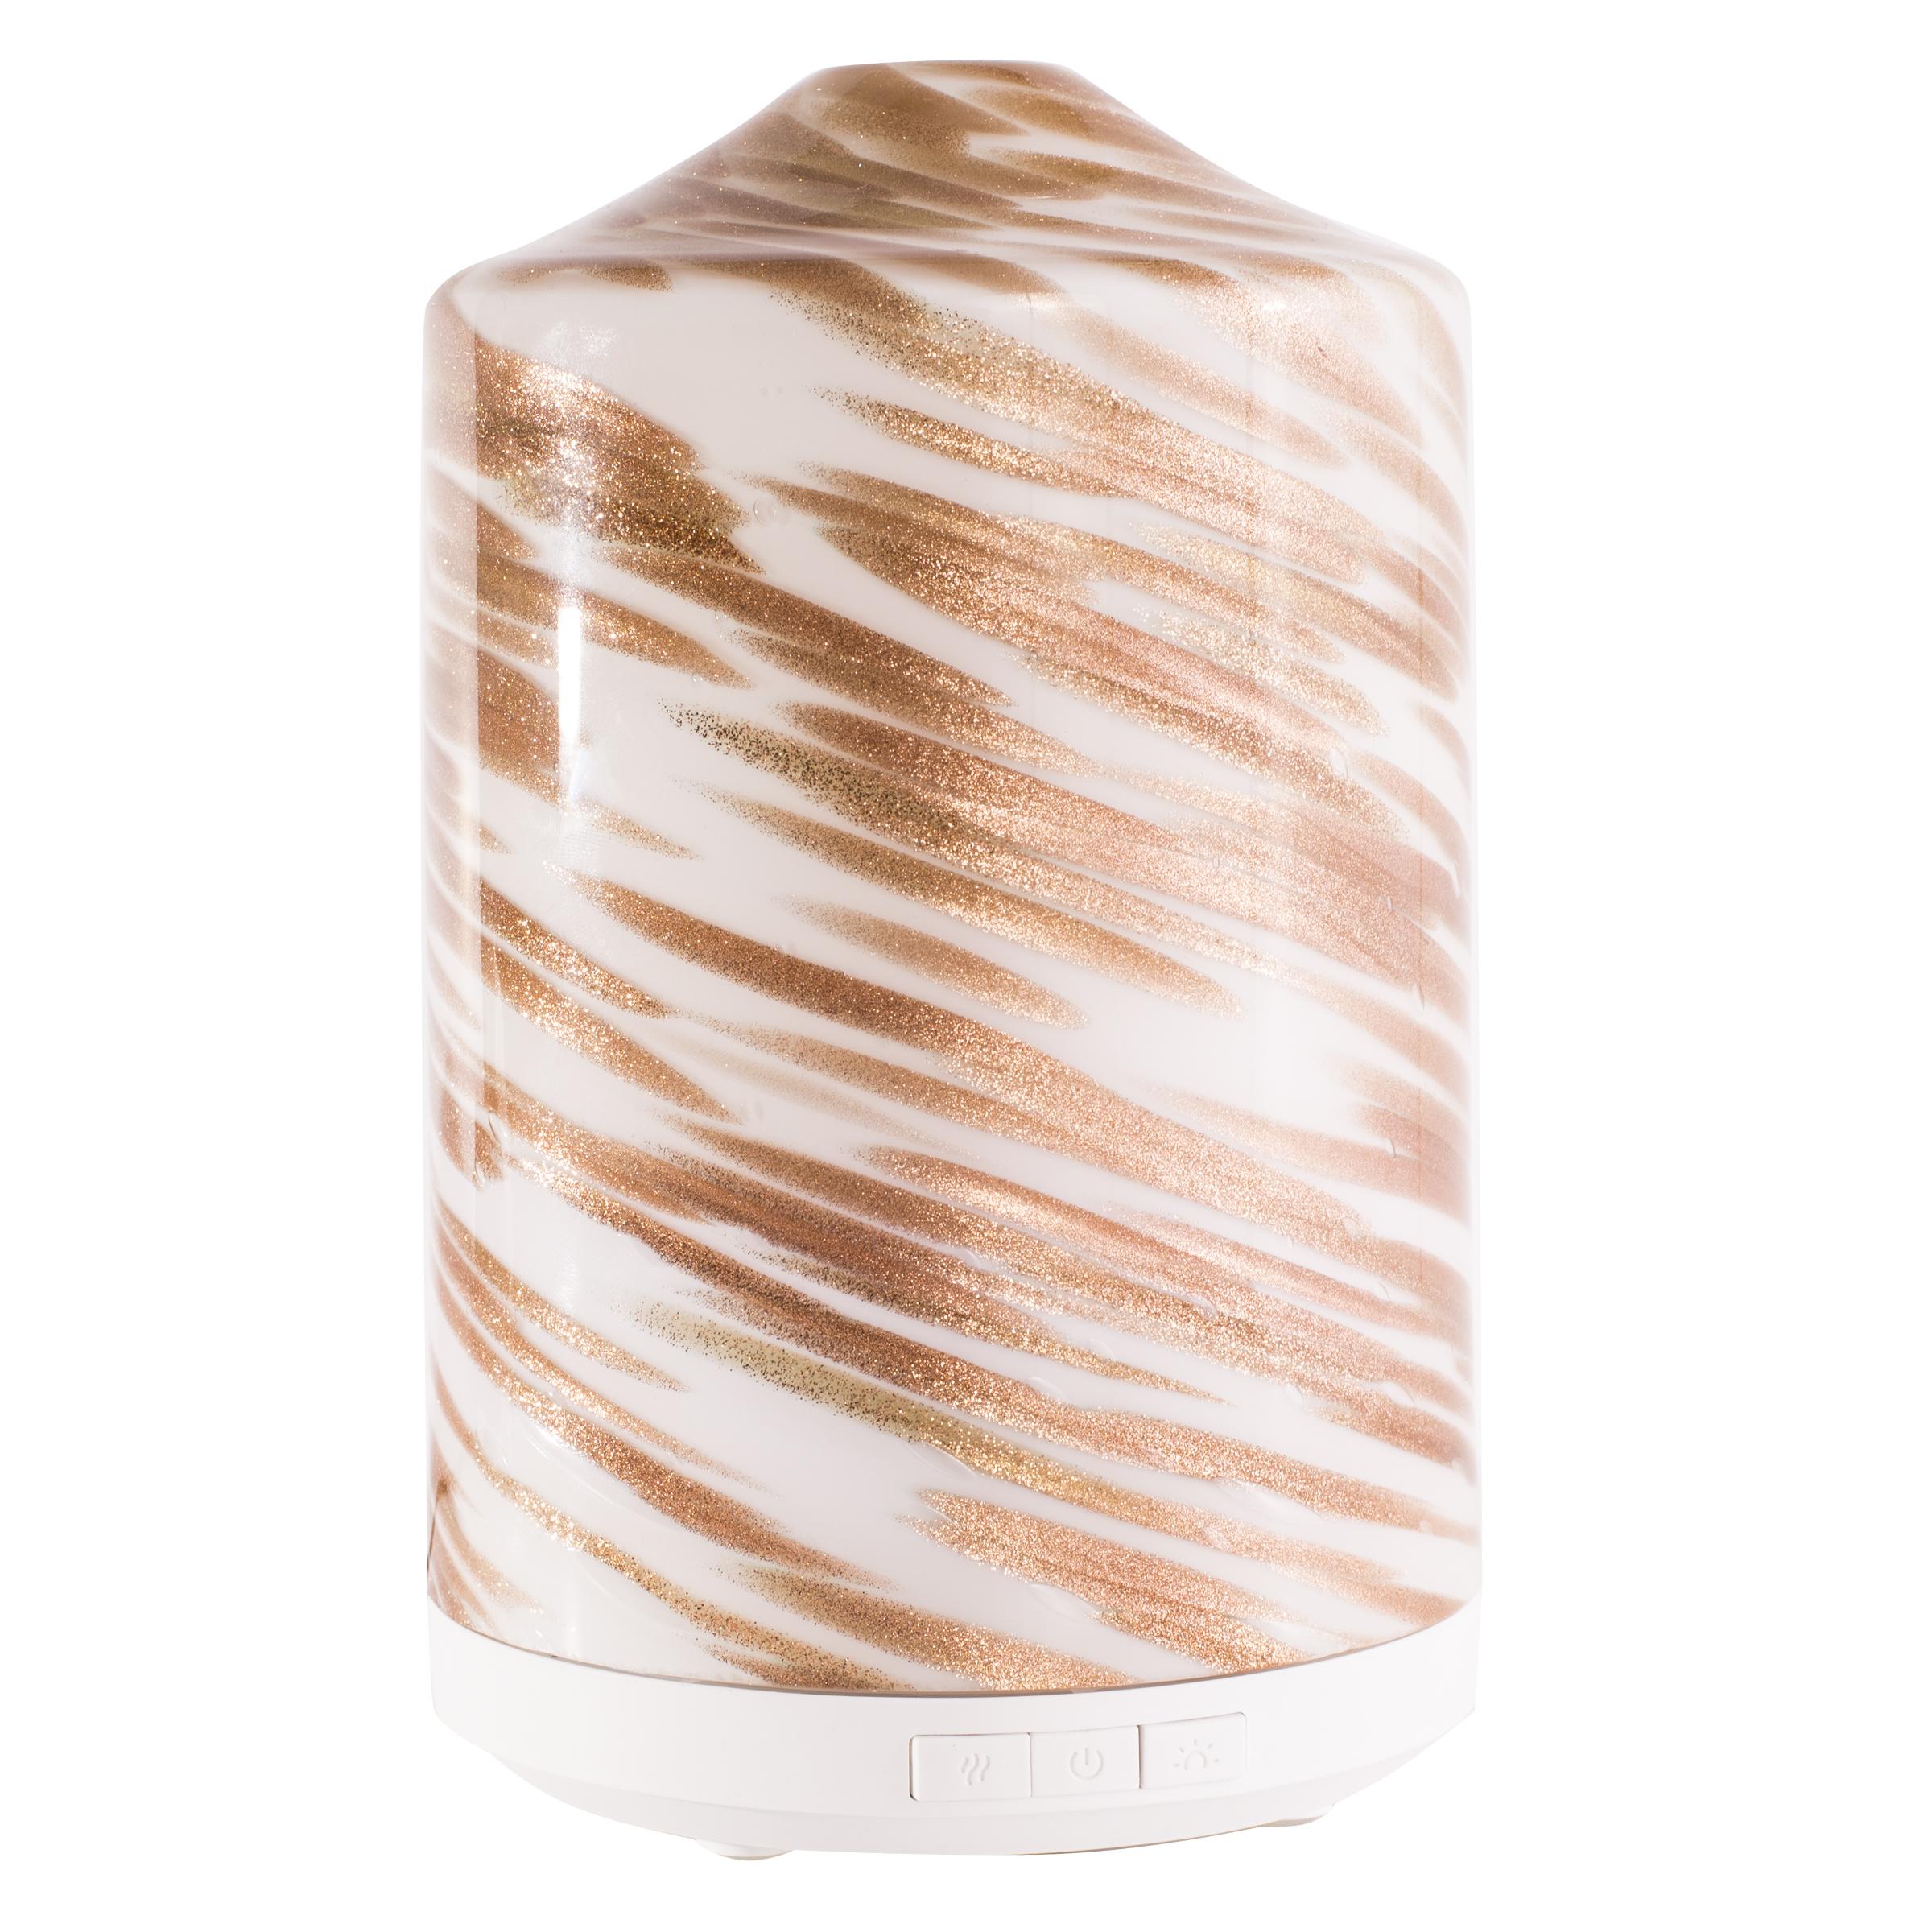 Better Homes & Gardens 250 mL Gold Swirl Cool Mist Ultrasonic Aroma Diffuser